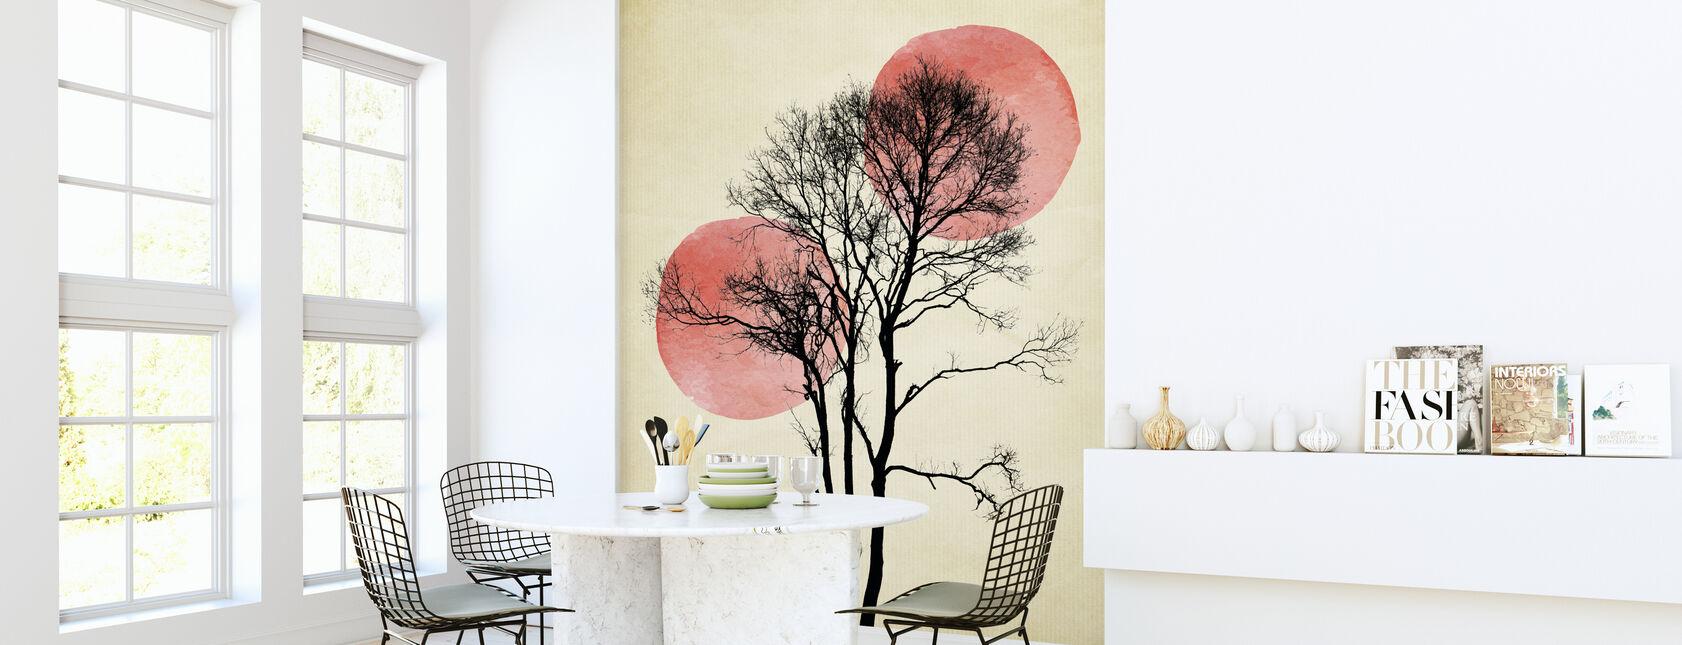 Sun and Moon Hiding - Wallpaper - Kitchen